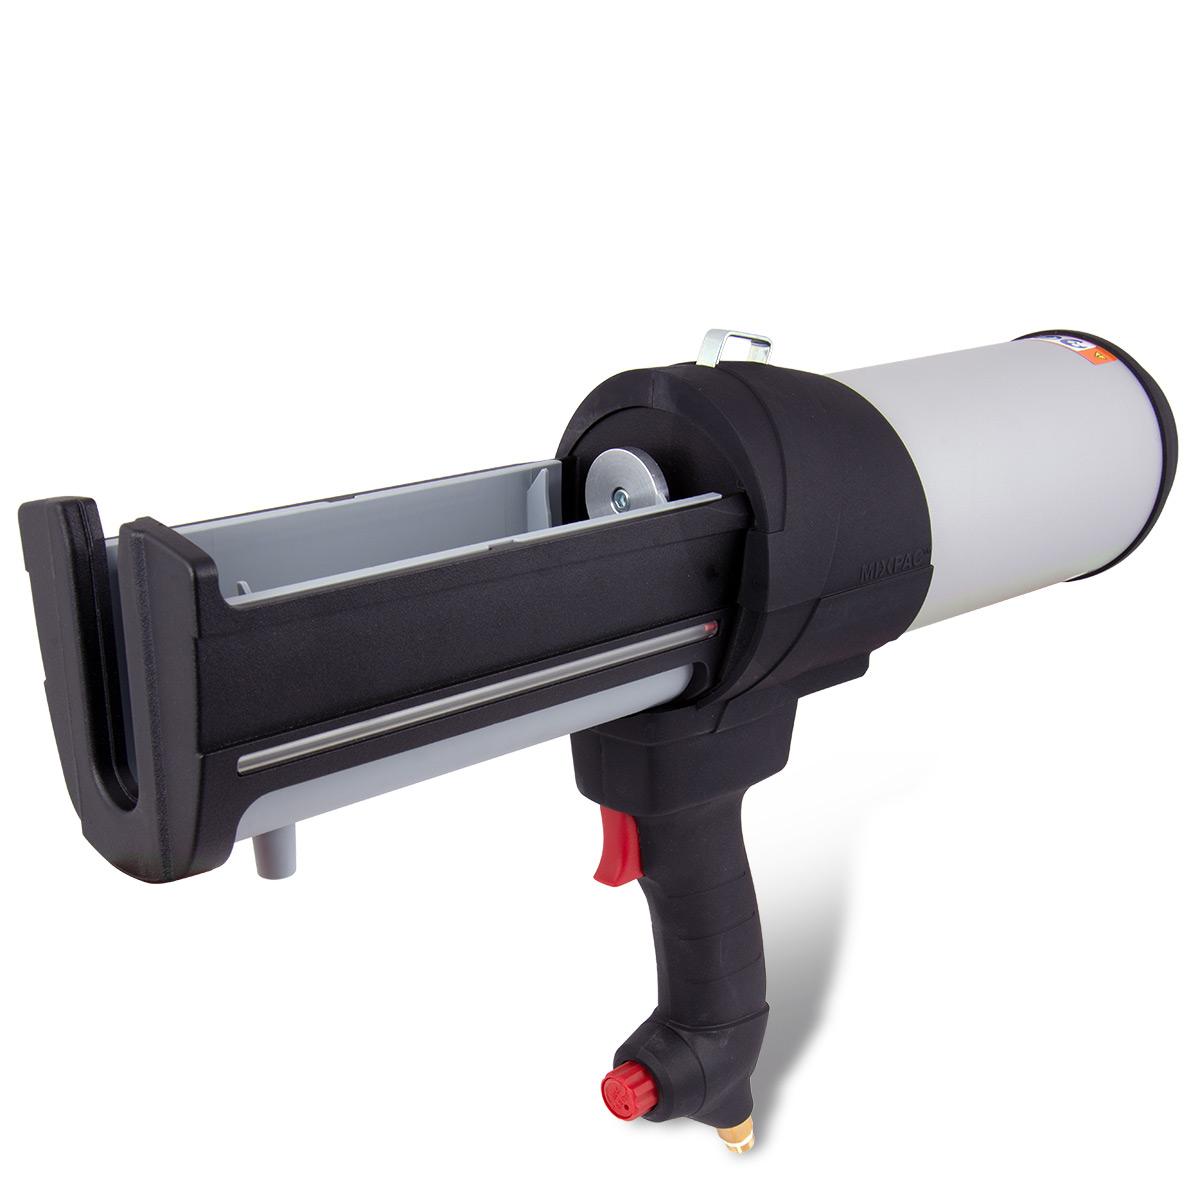 Metal gun 400 pneumatic 1:1/2:1